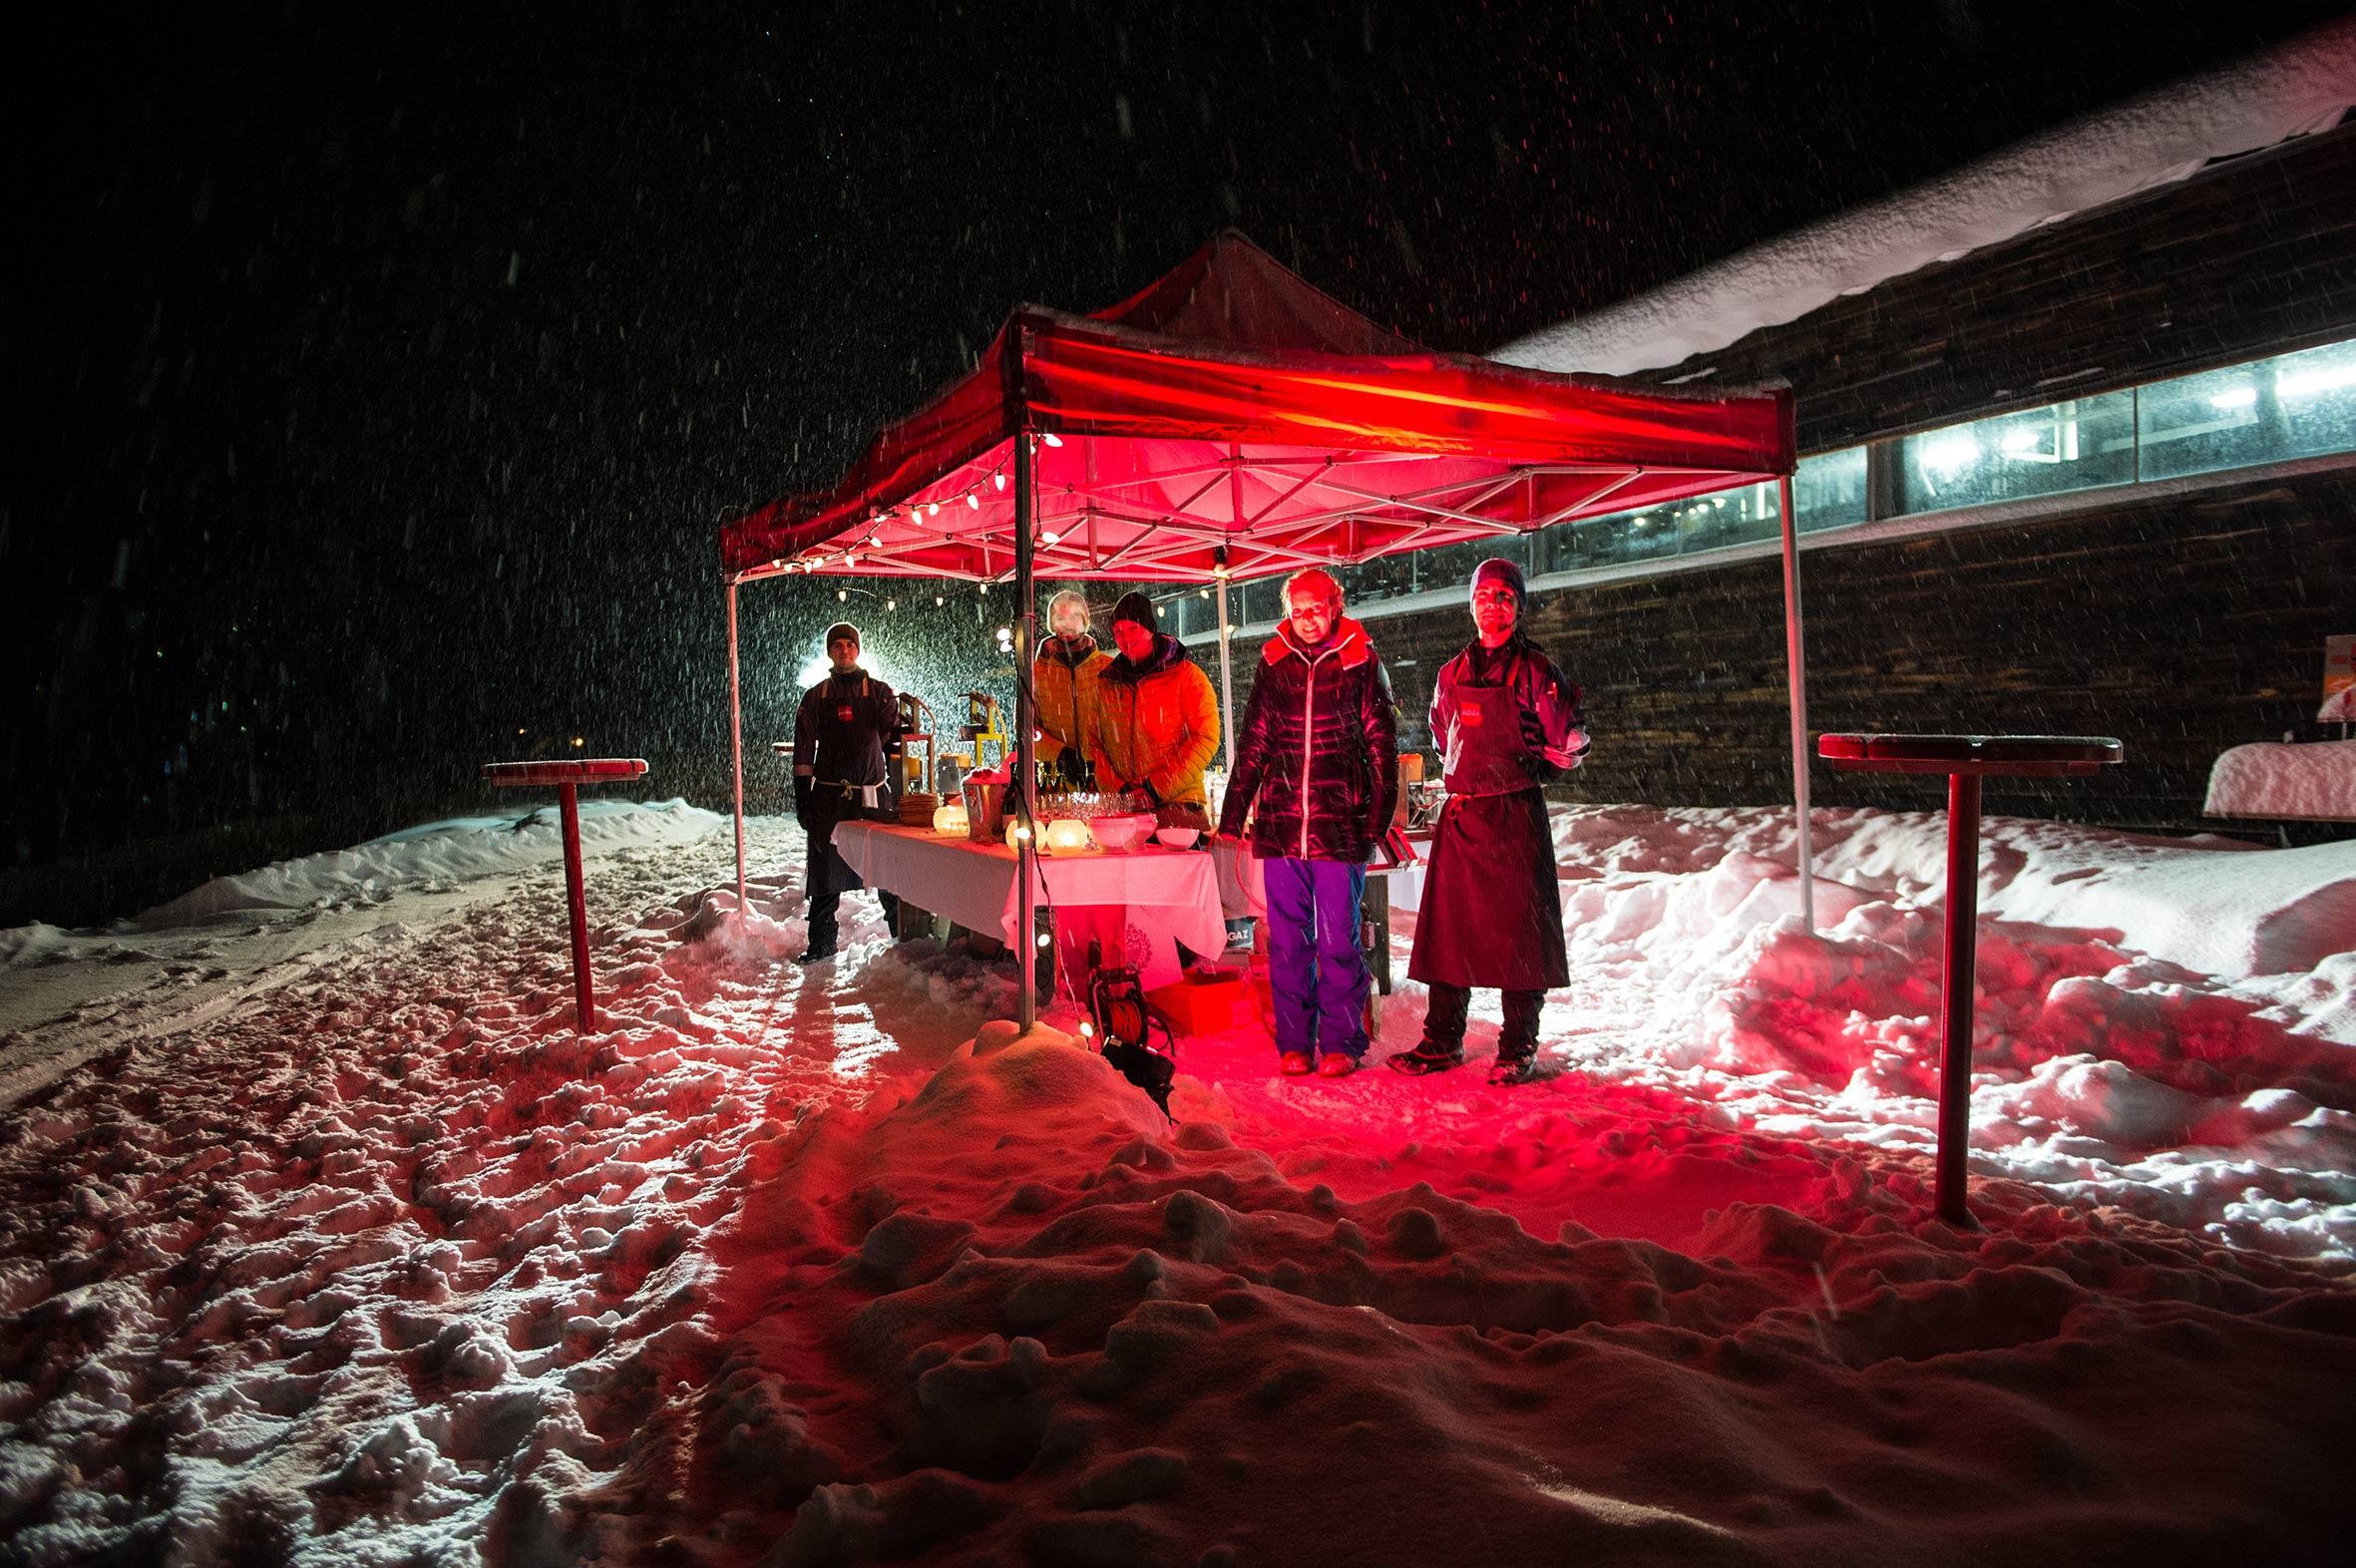 elparadiso-events-empfang-outdoor.jpg